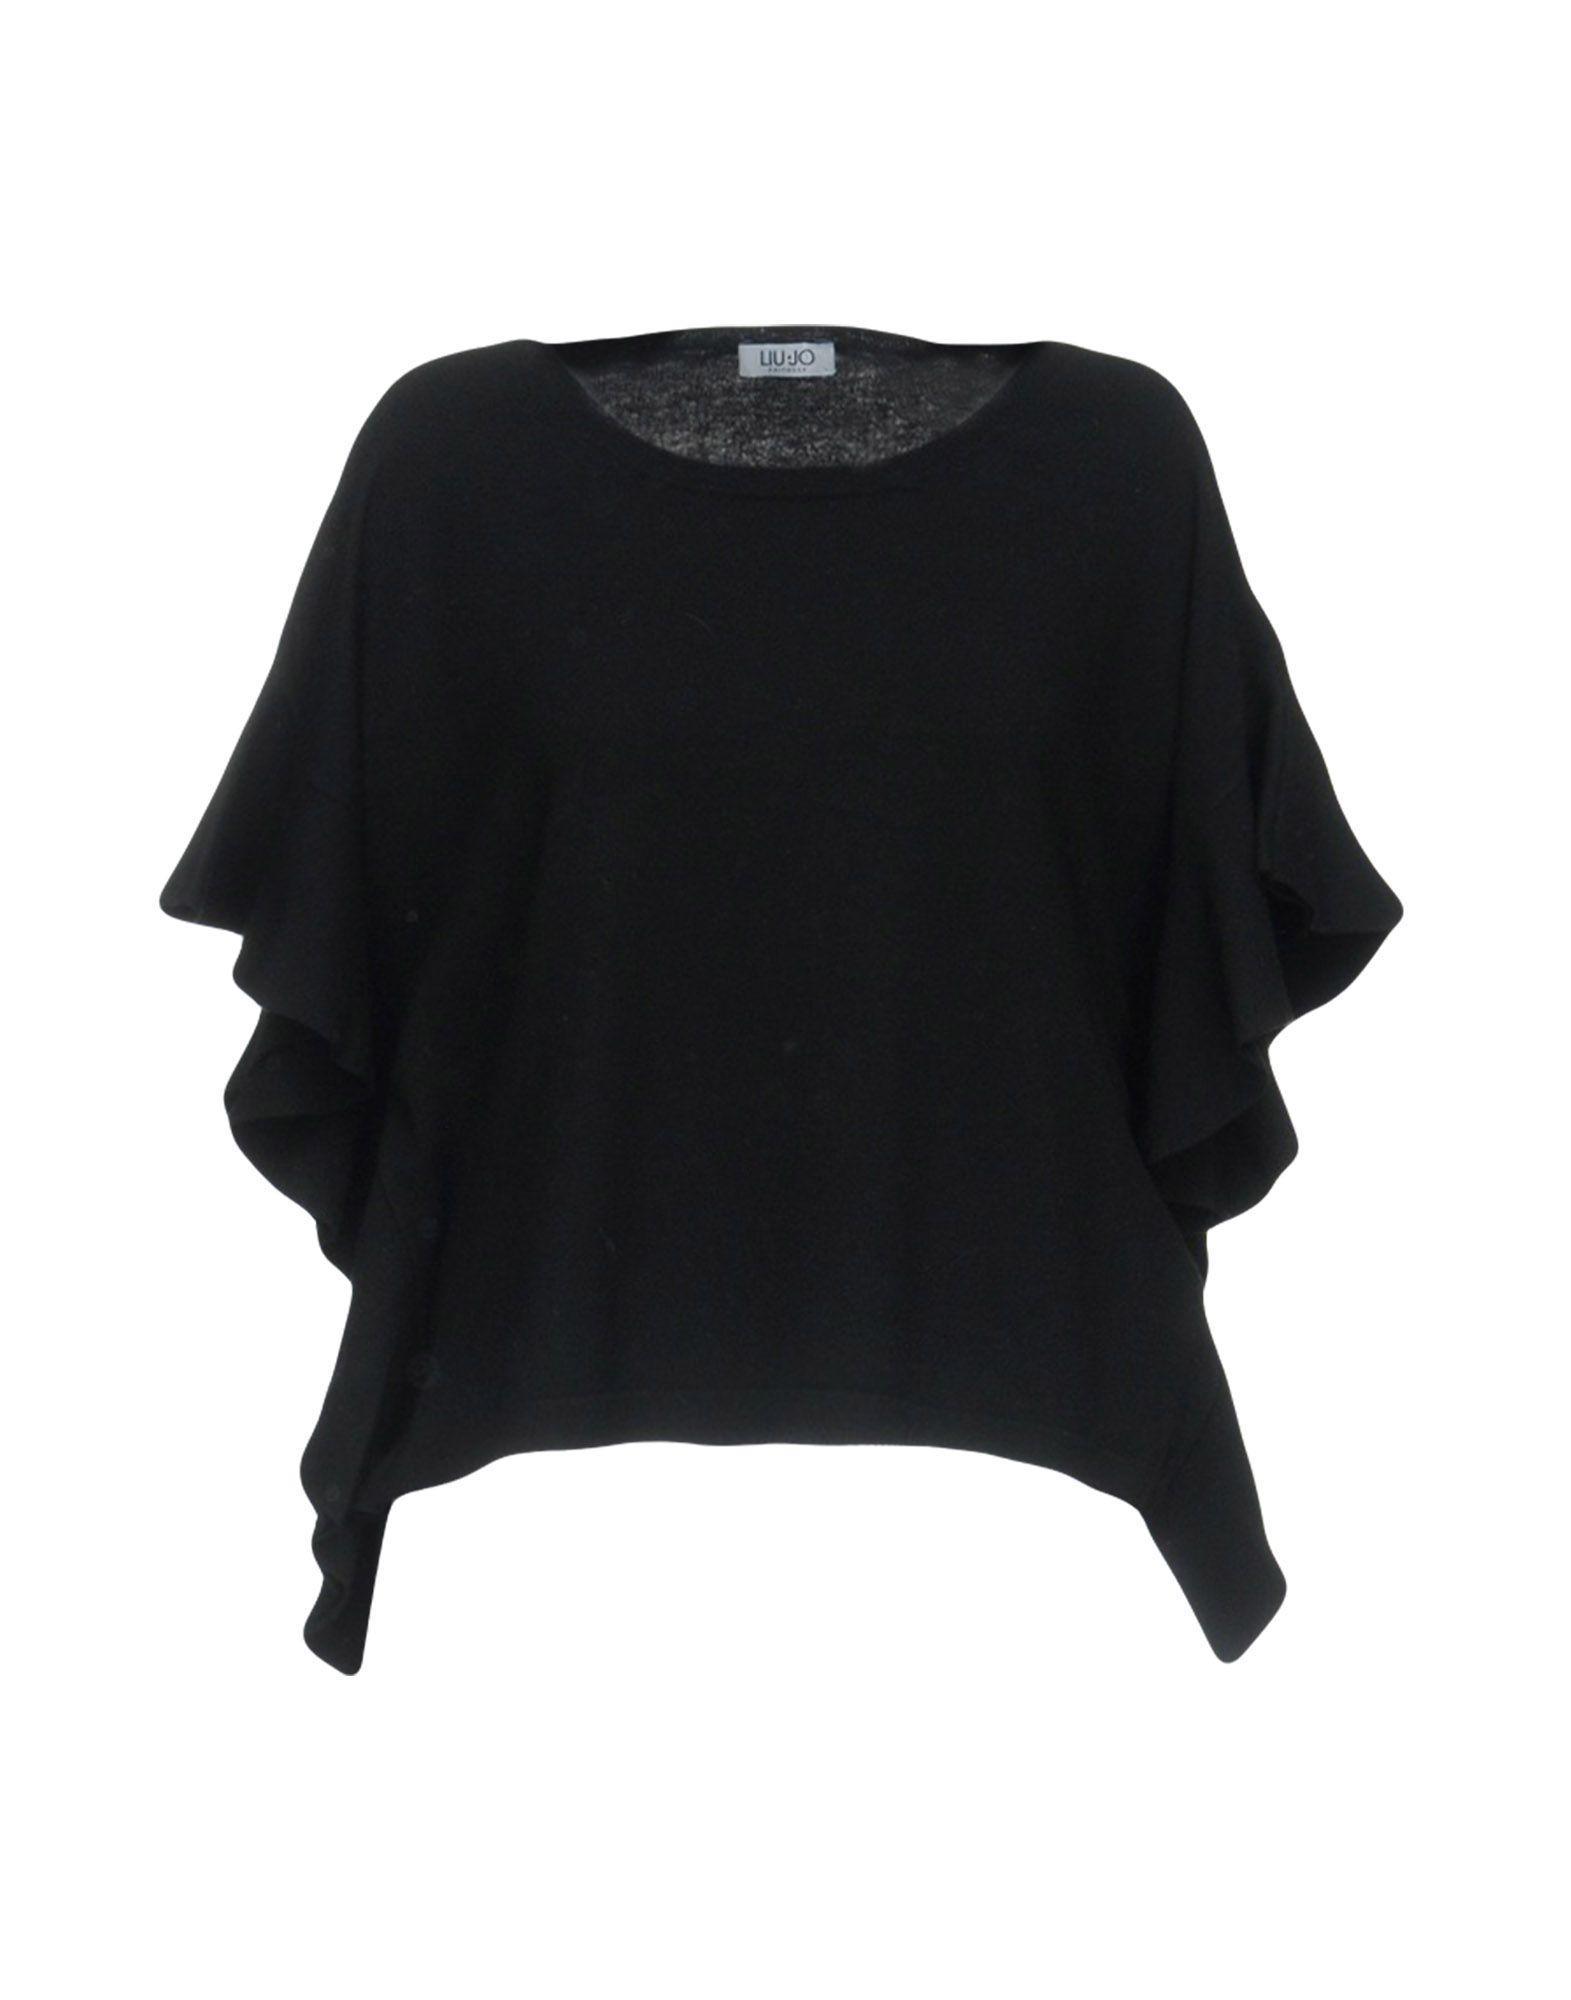 Liu •jo Sweater In Black